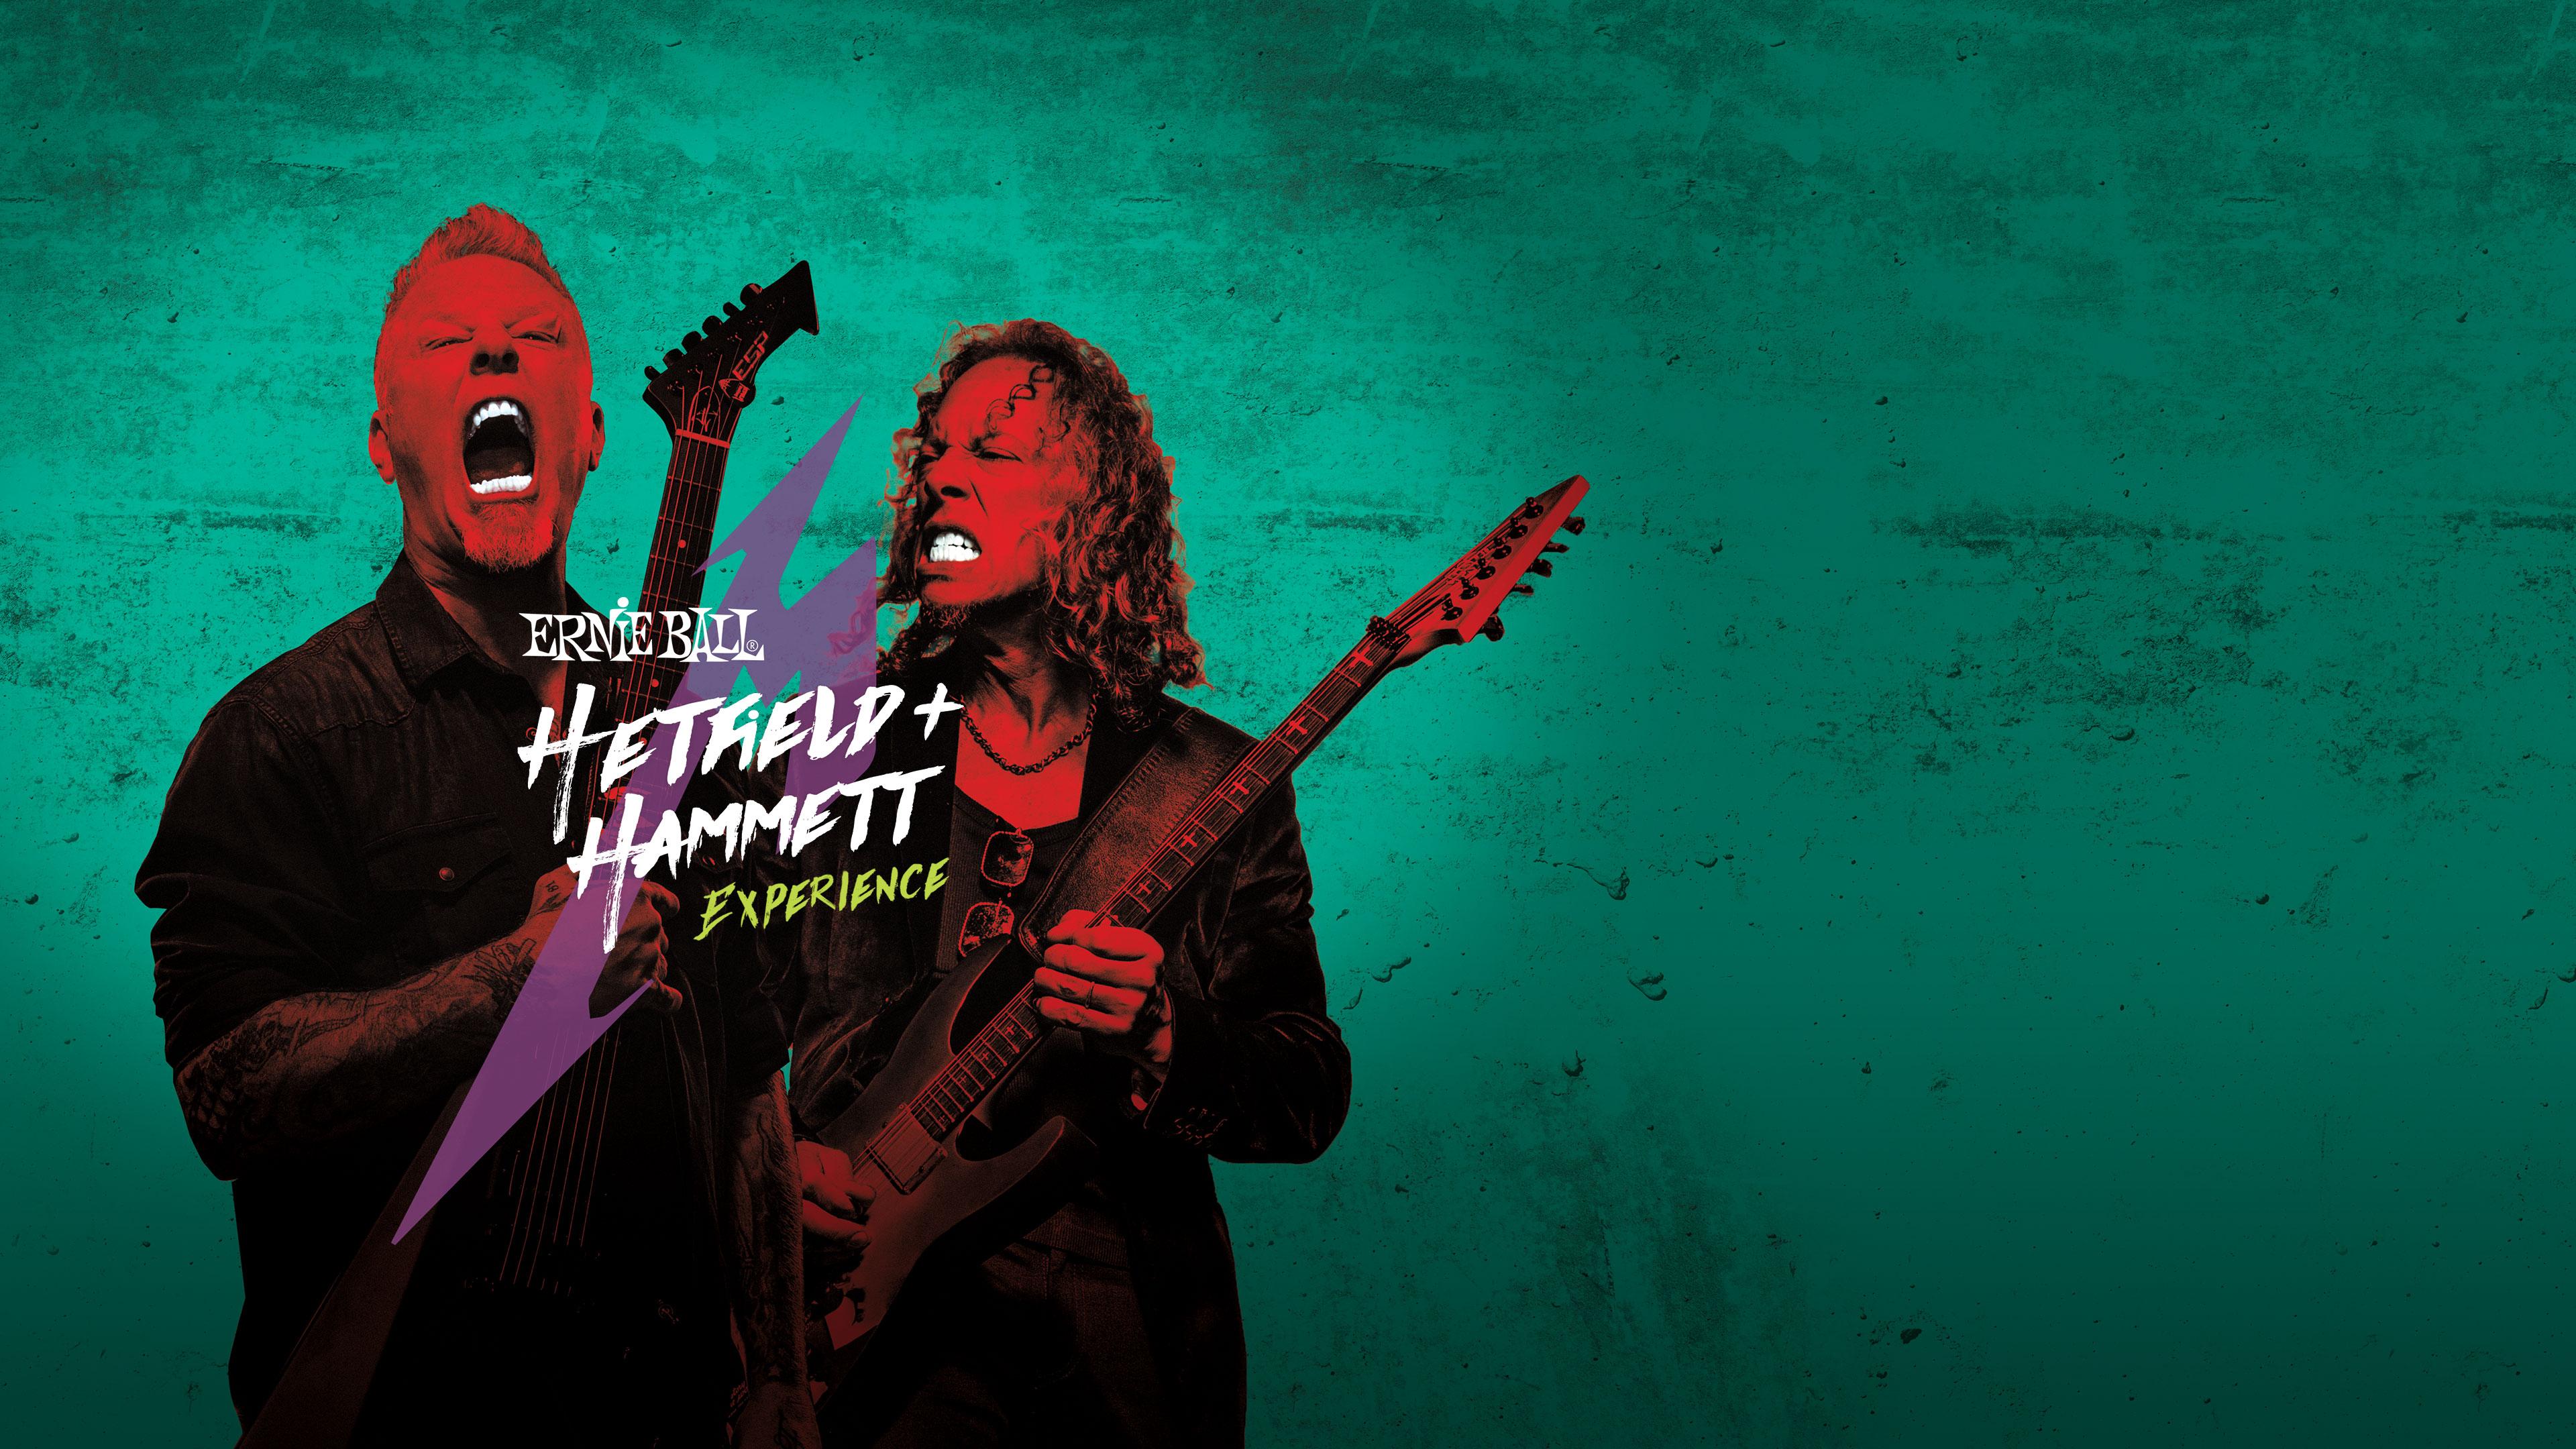 Hetfield Hammett Experience Ernie Ball